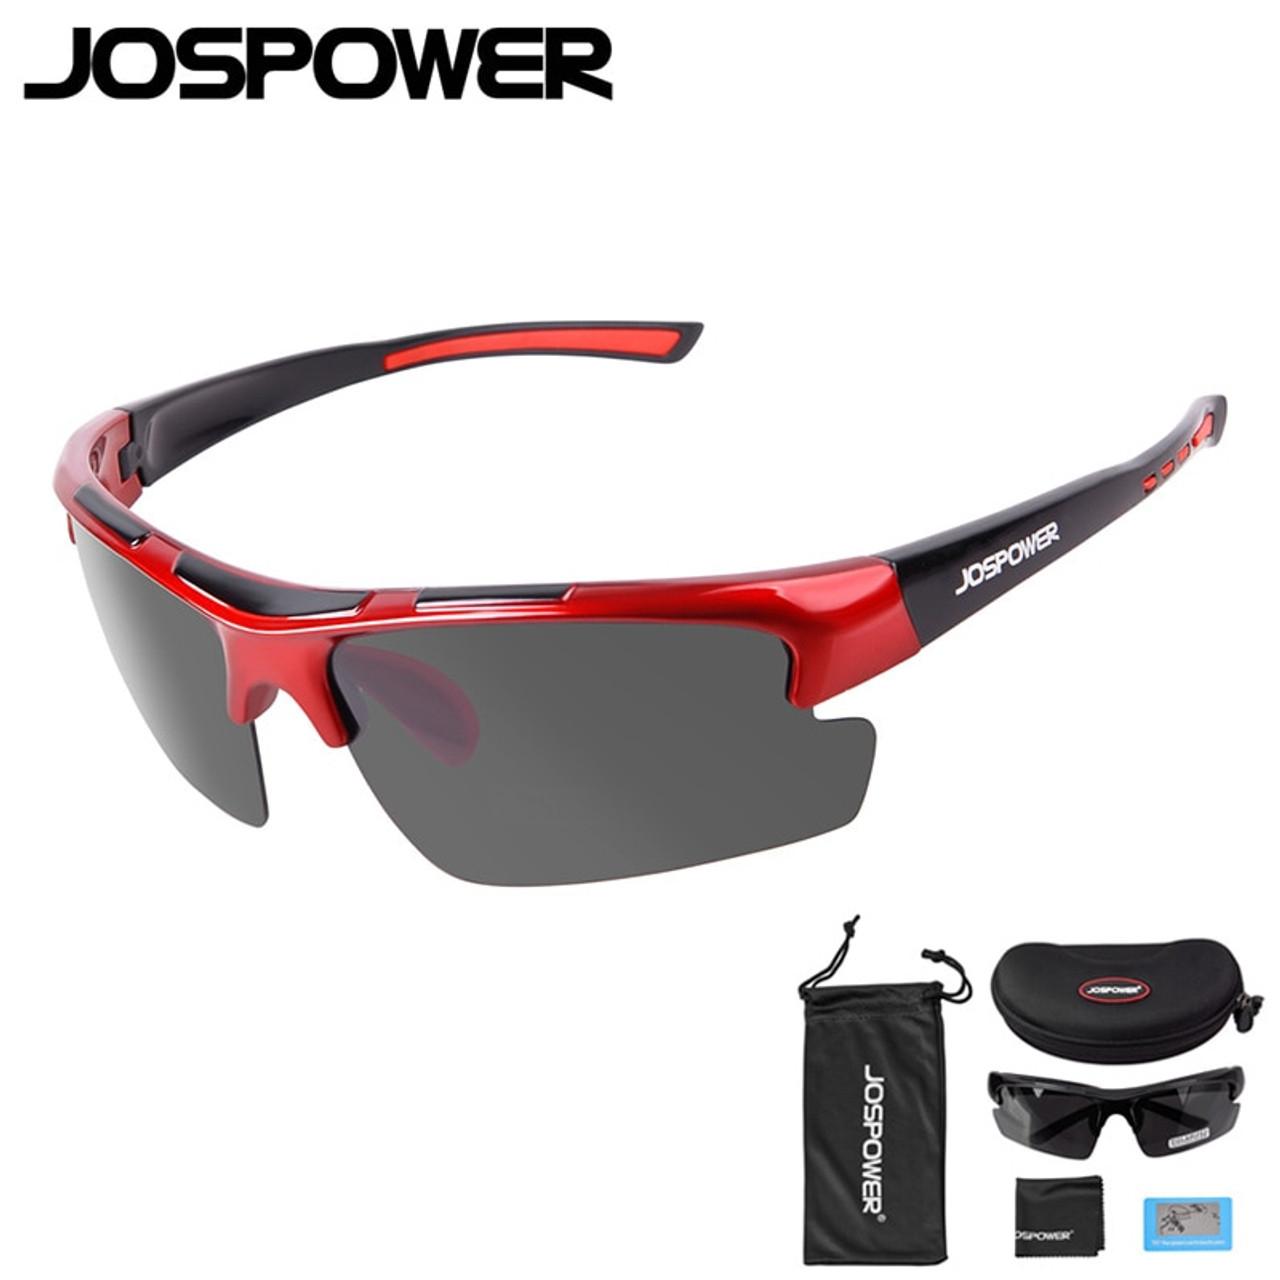 7a794bbe29 JOSPOWER New Men Women Cycling Glasses Polarized UV 400 Fishing Sunglasses  Sport Climbing Hiking Driving Eyewear ...